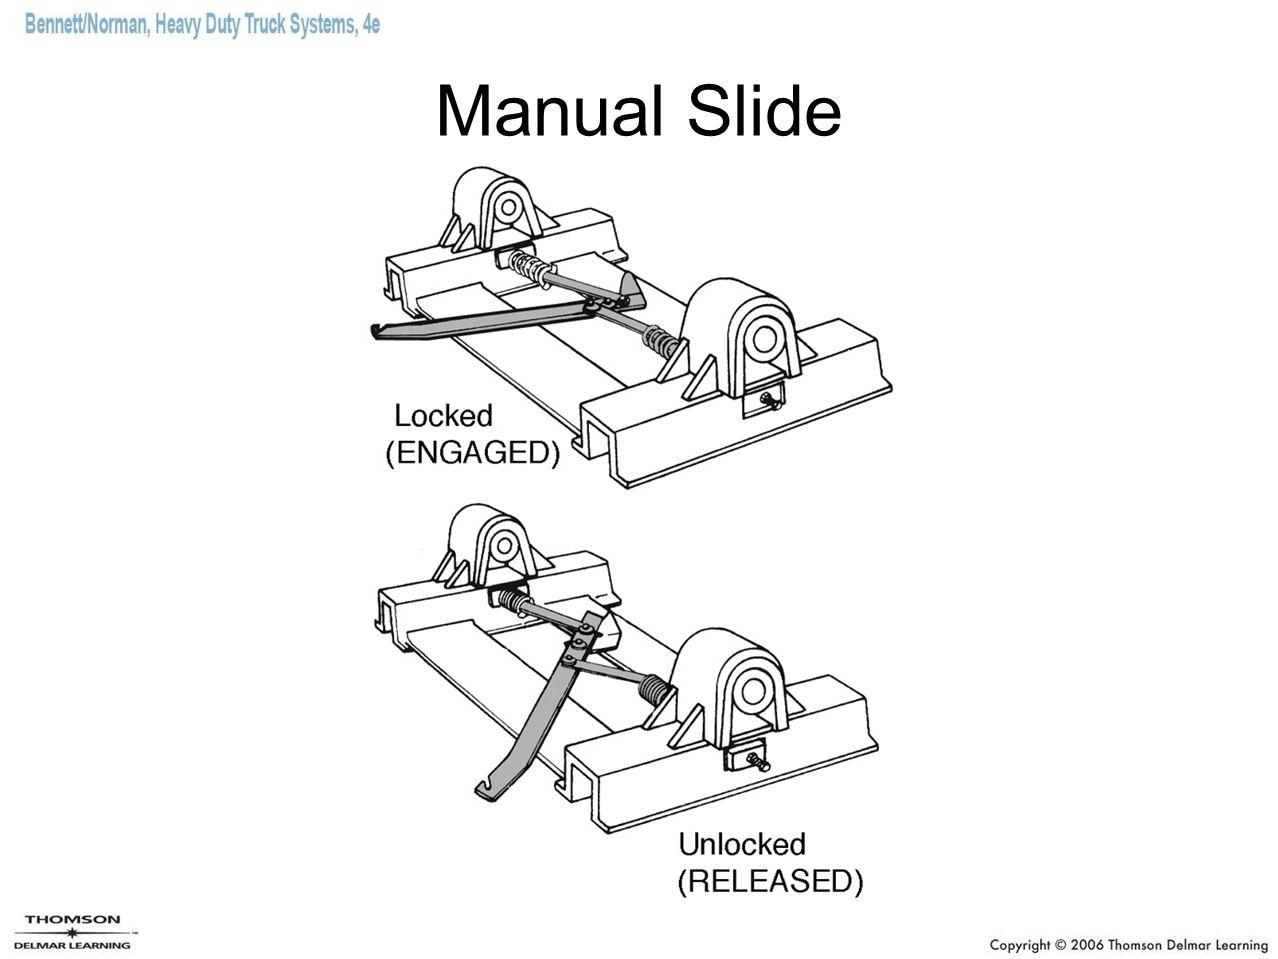 Manual Slide